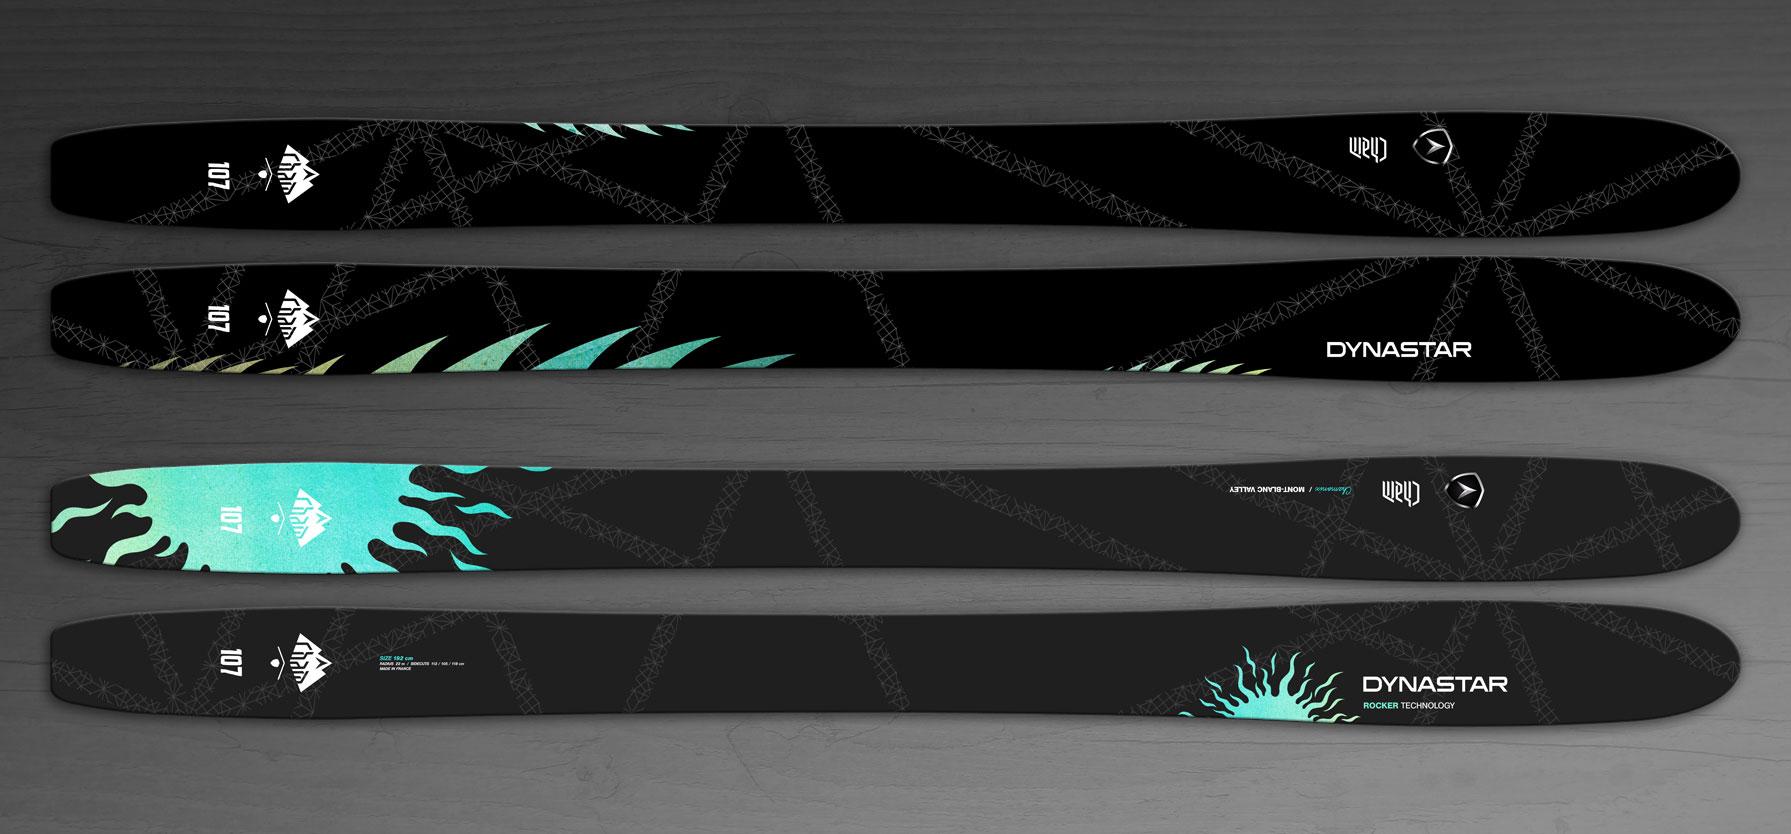 dynastar-skis-powertrack-04